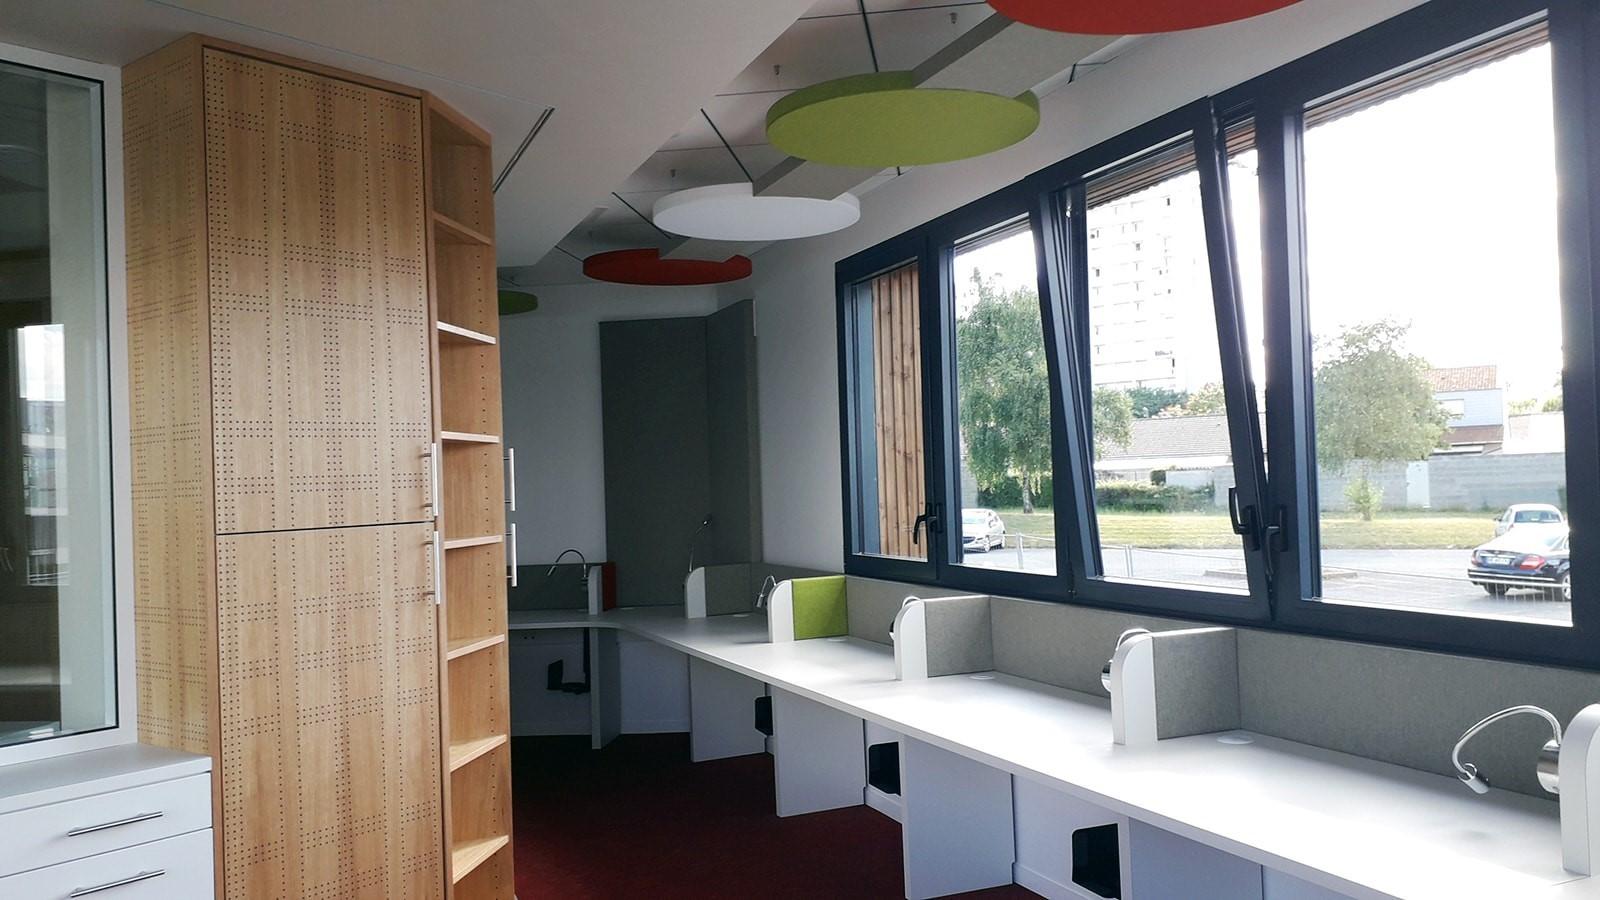 Bureaux Had Cholet Efi Design (9)